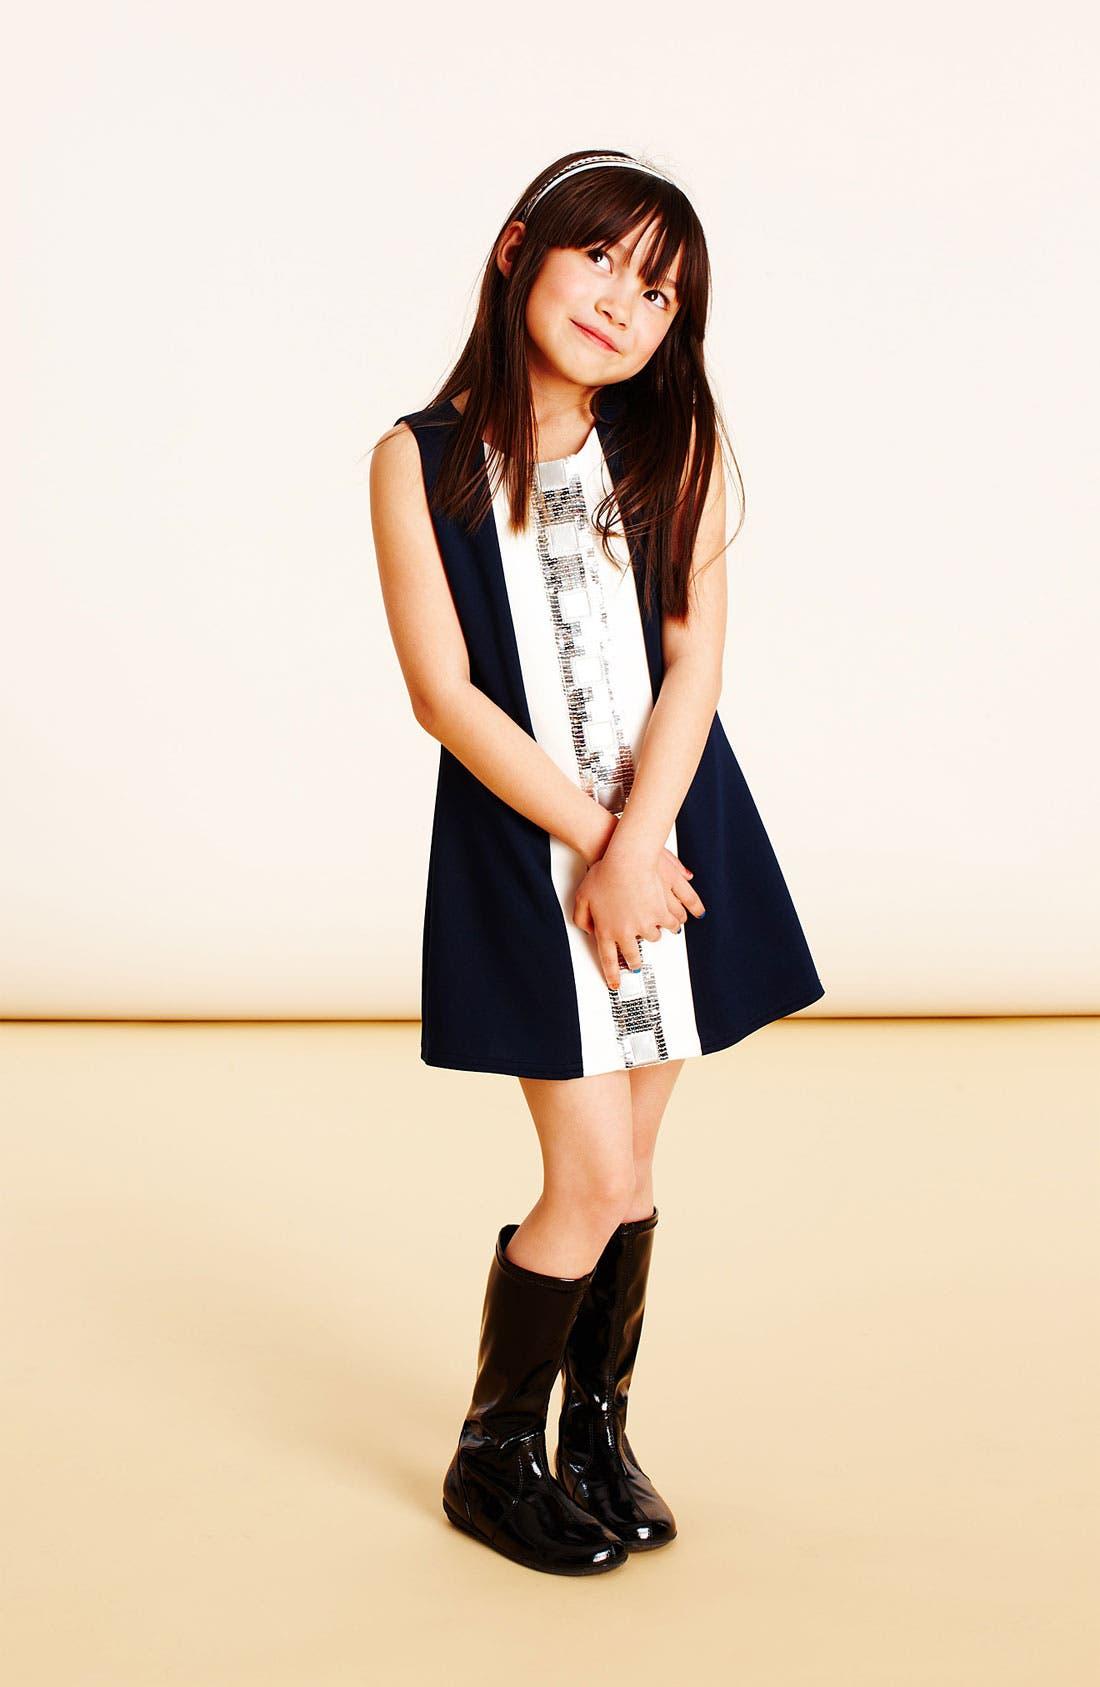 Main Image - Zoe Ltd 'Mod' Dress & Ruby & Bloom Cardigan (Big Girls)